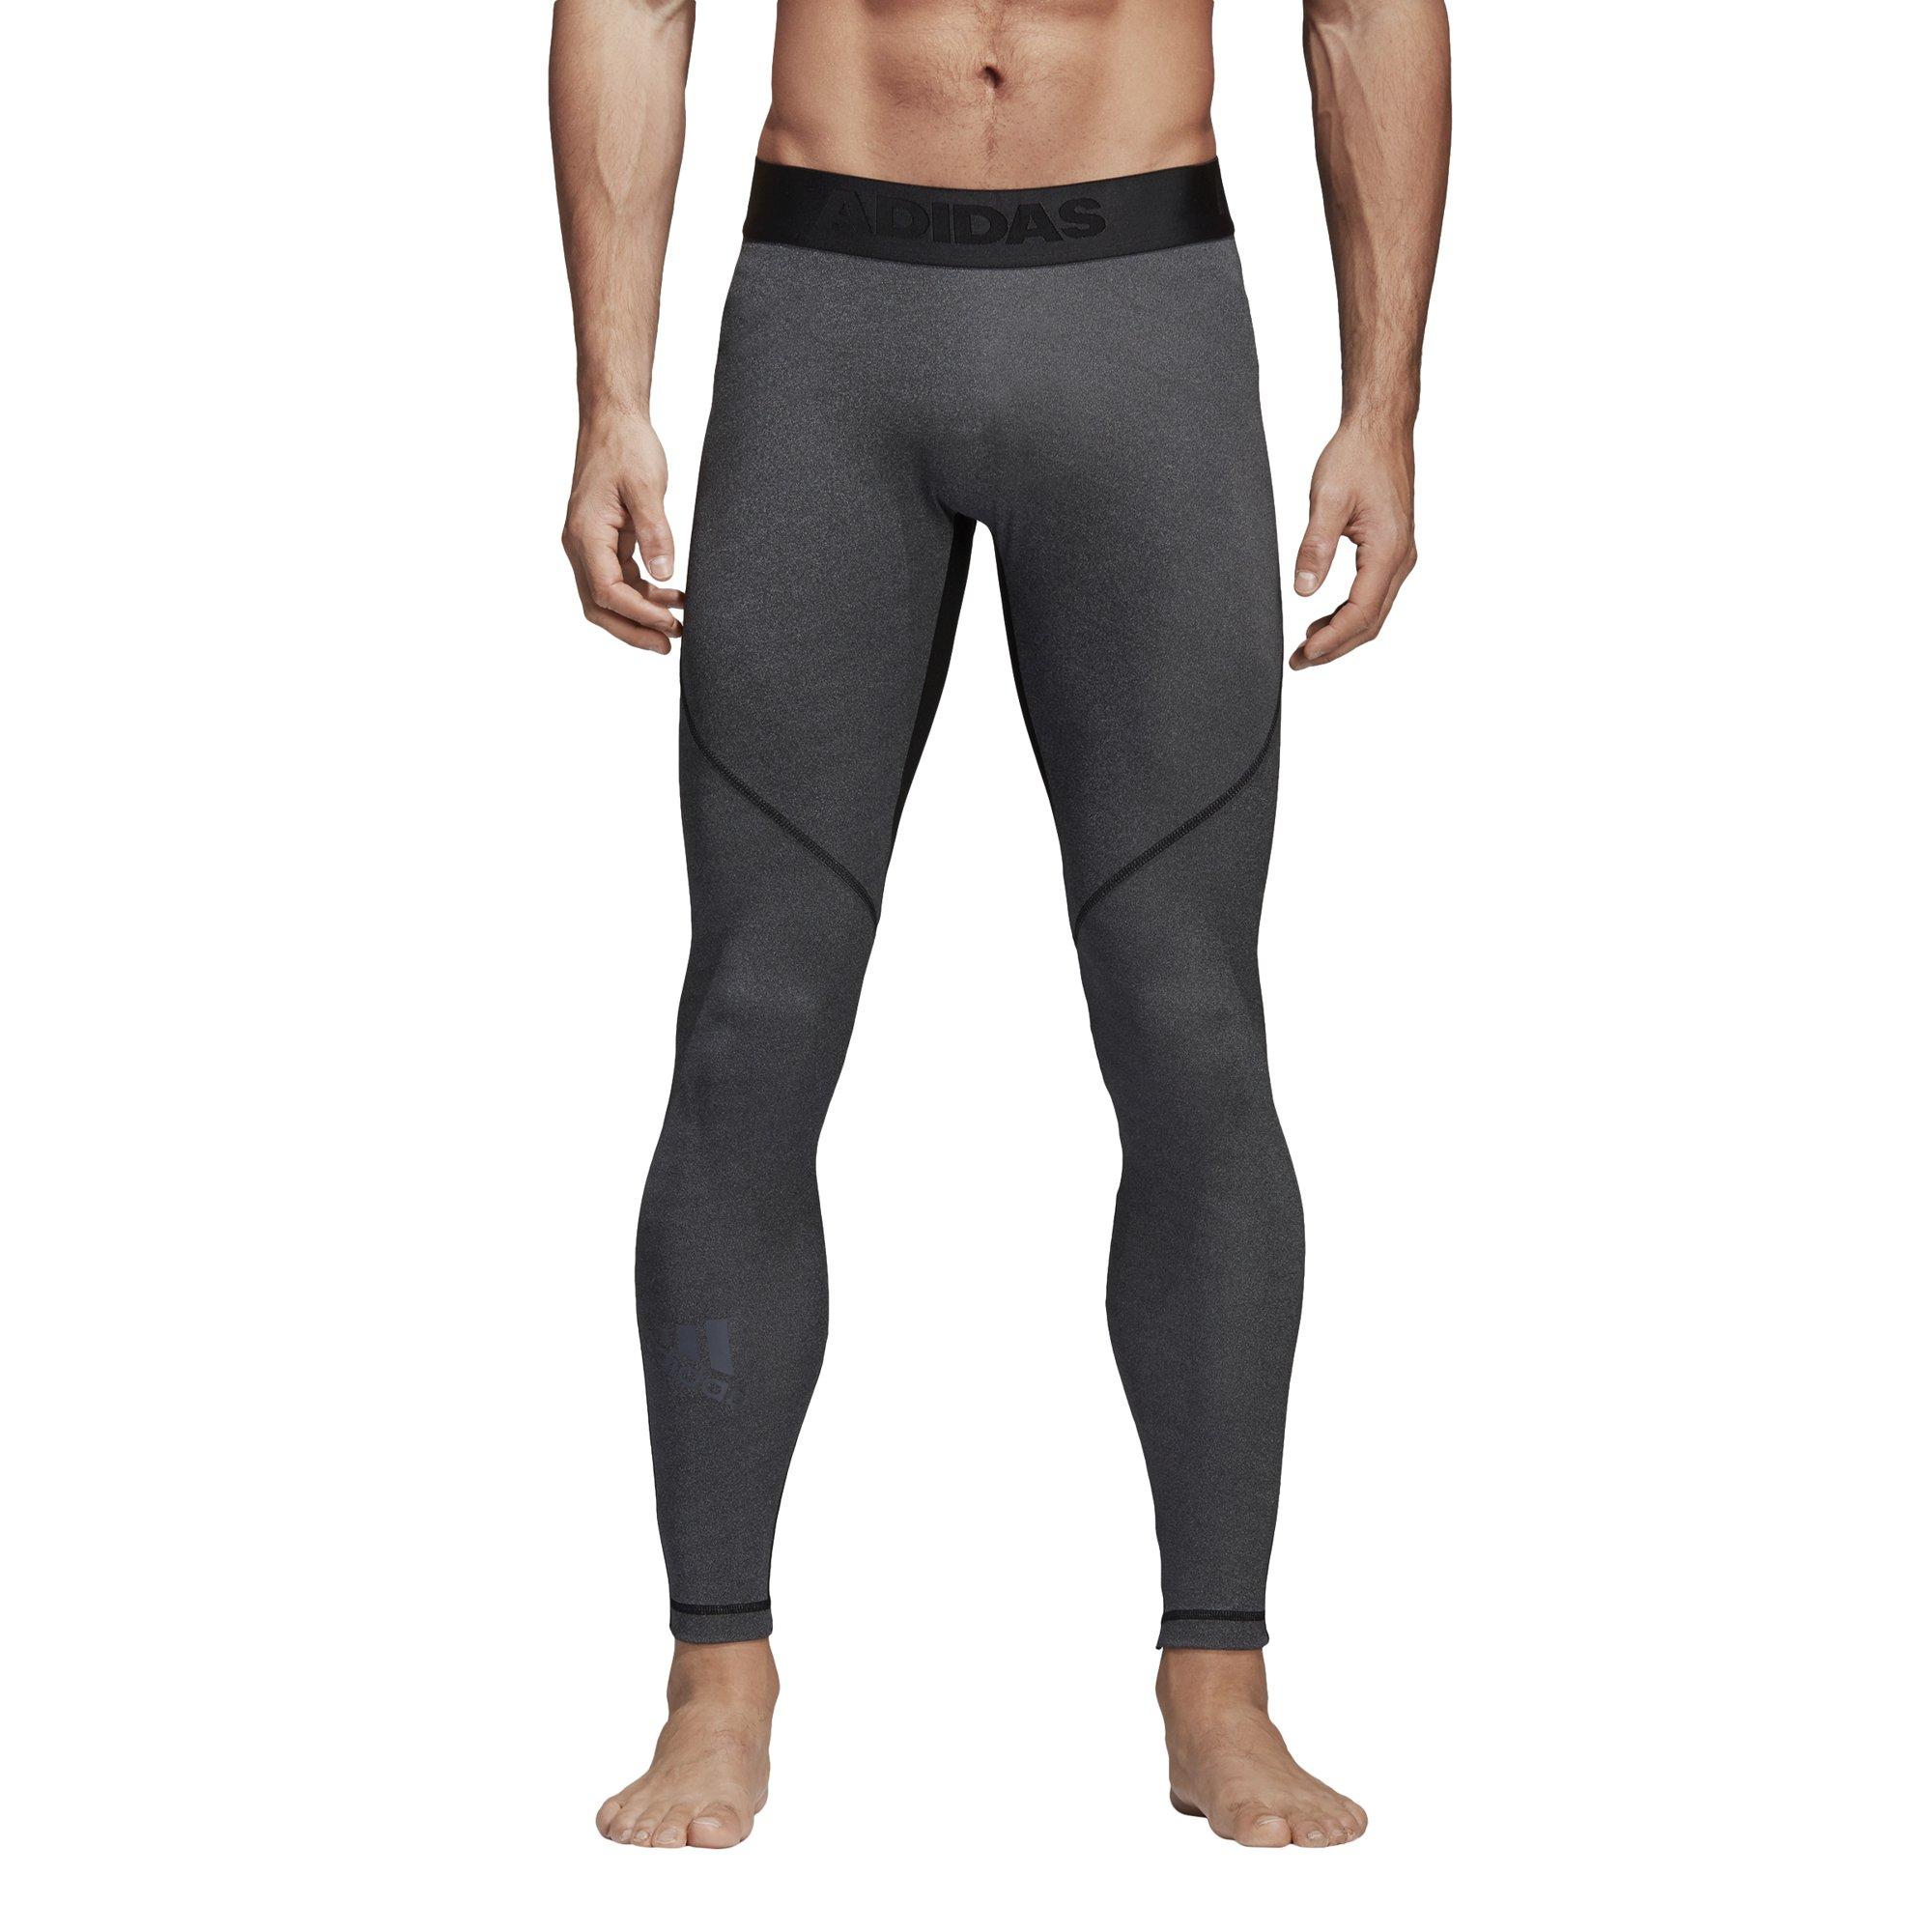 adidas Men's Training Alphaskin Sport Long Tights, Dark Grey Heather/Black, Small